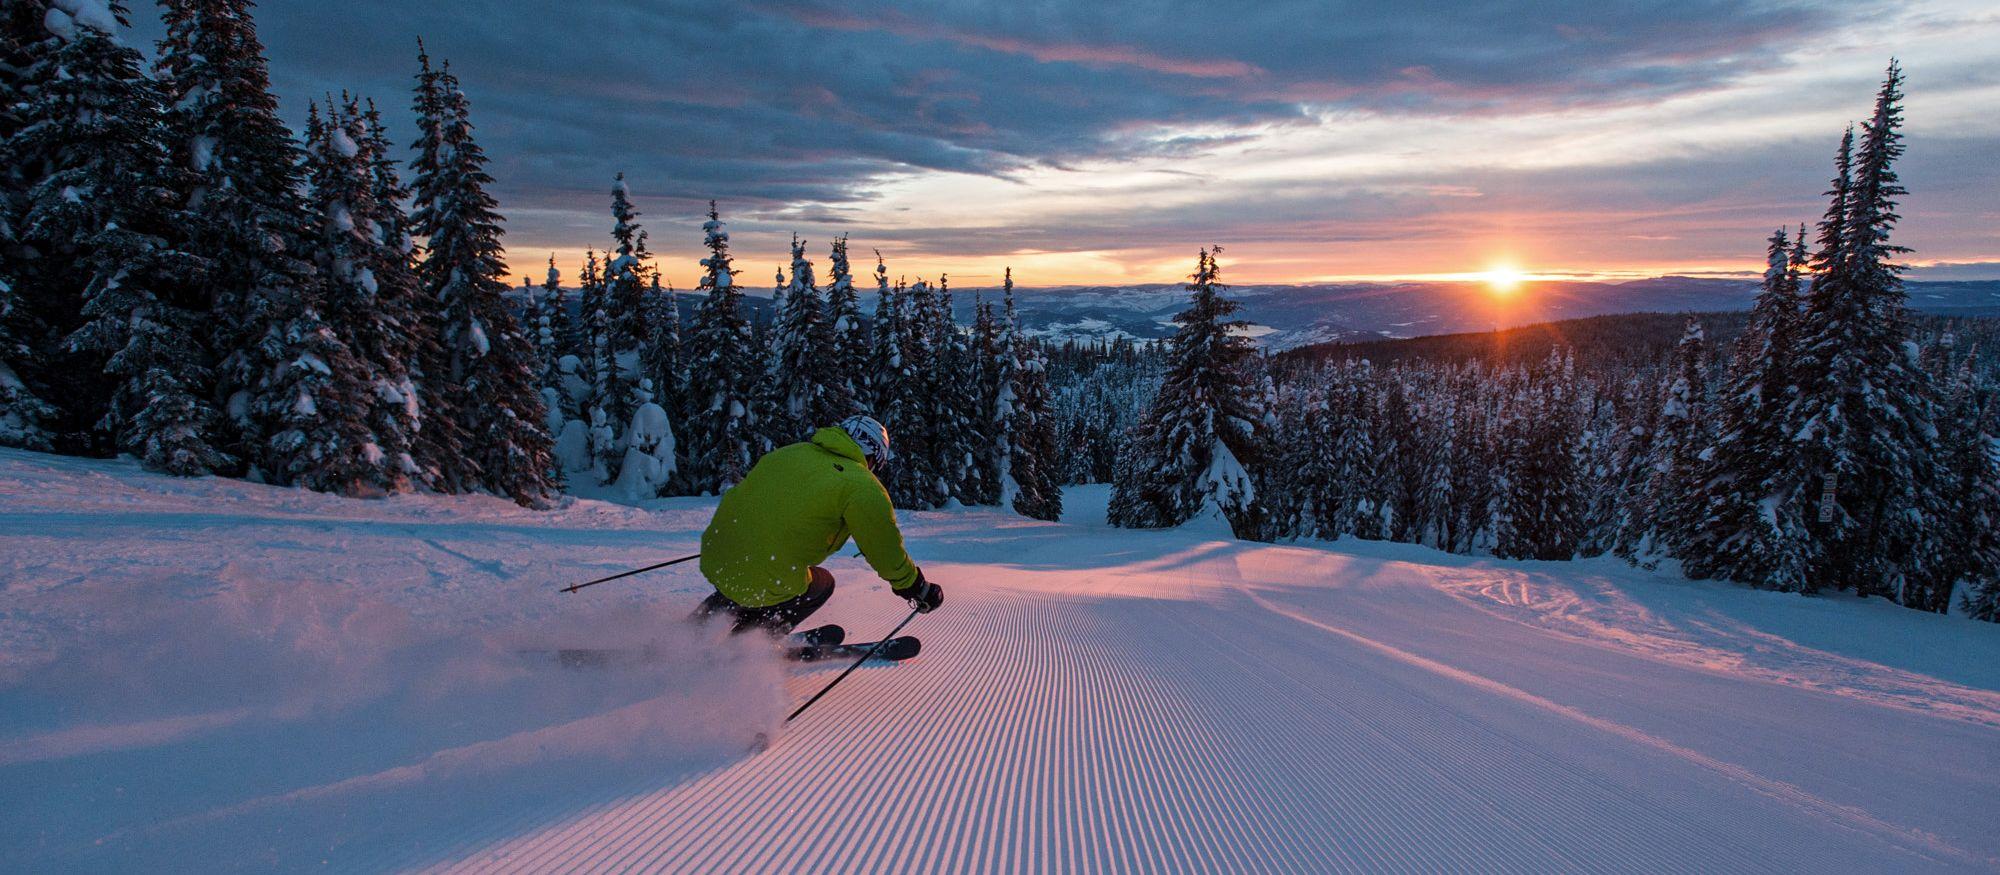 Ski fahren im Silver Star Mountain Resort bei Sonnenuntergang